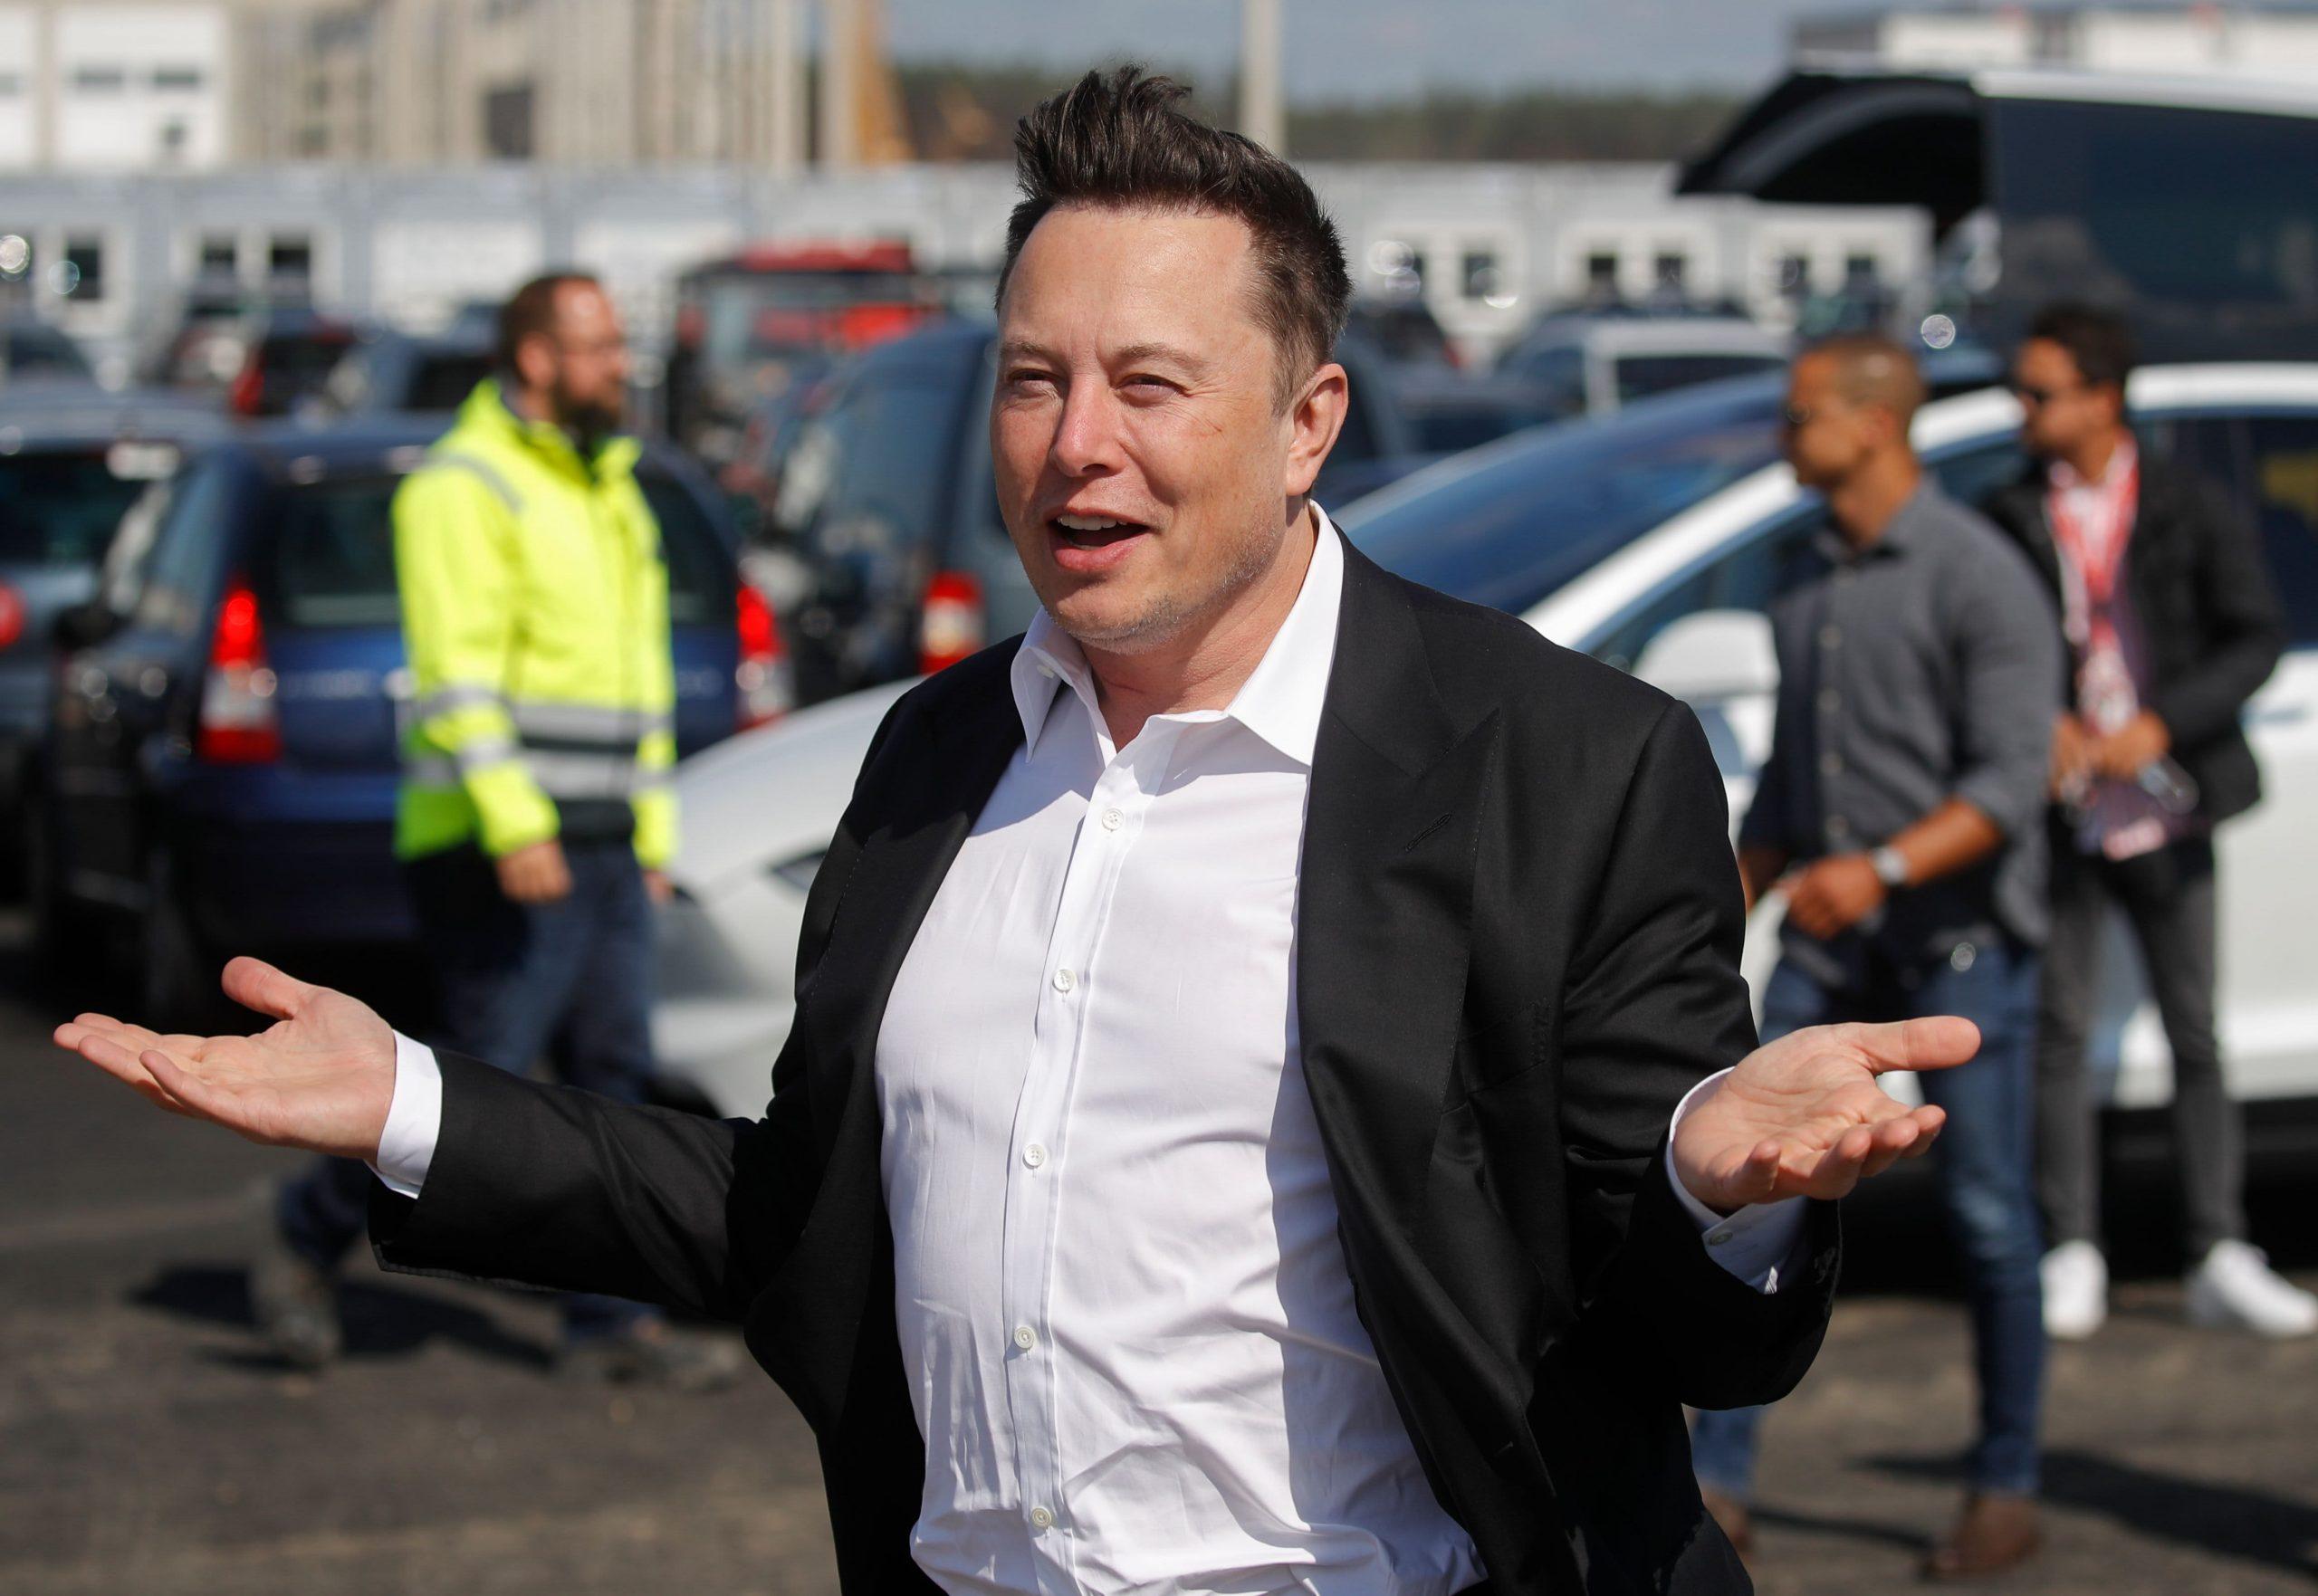 Tesla, Western Digital, Enphase Energy, and more